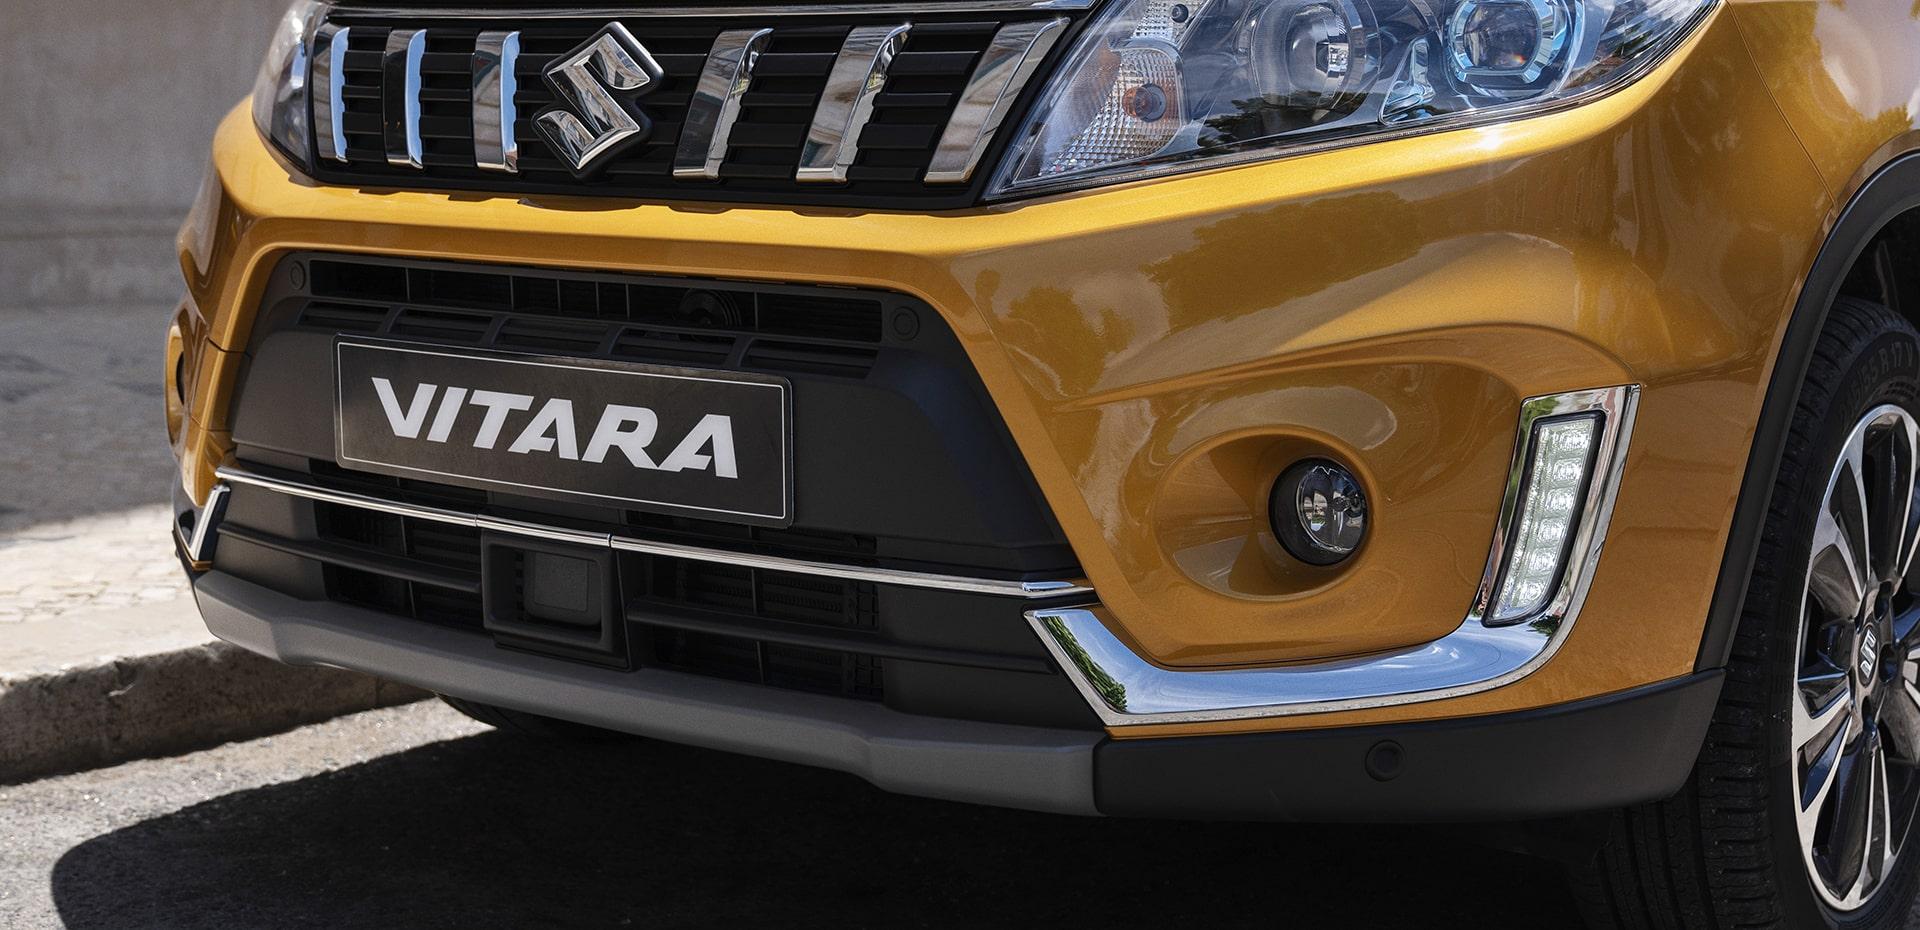 Suzuki Vitara 4STYLE 1